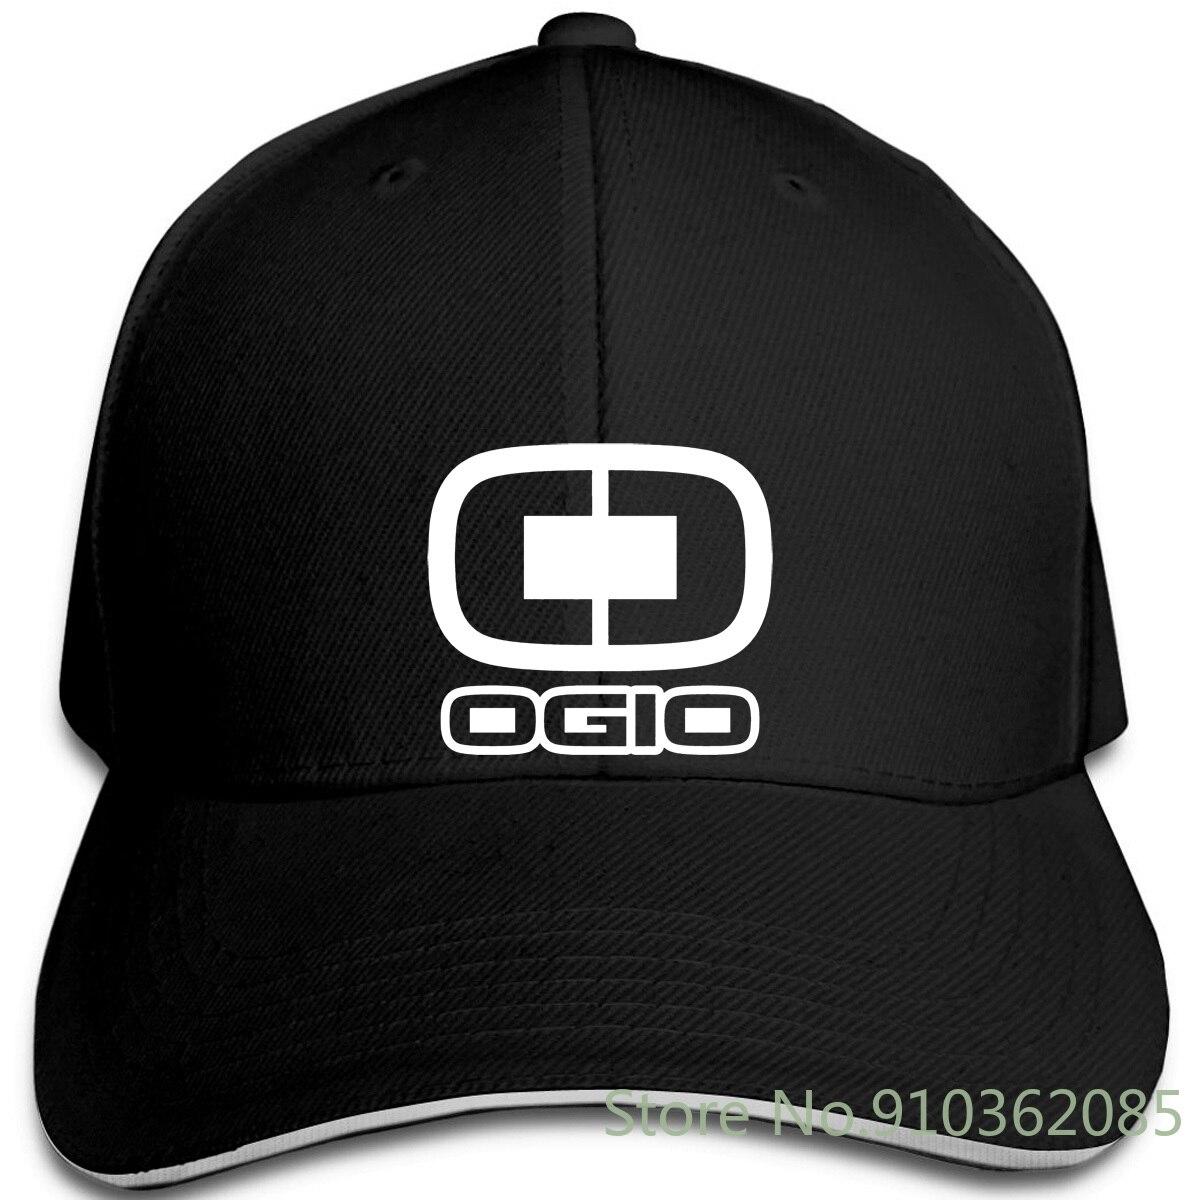 Logo Vintage NHRA Ogio Golfer Cool estampado gorras ajustables gorra de béisbol hombres mujeres